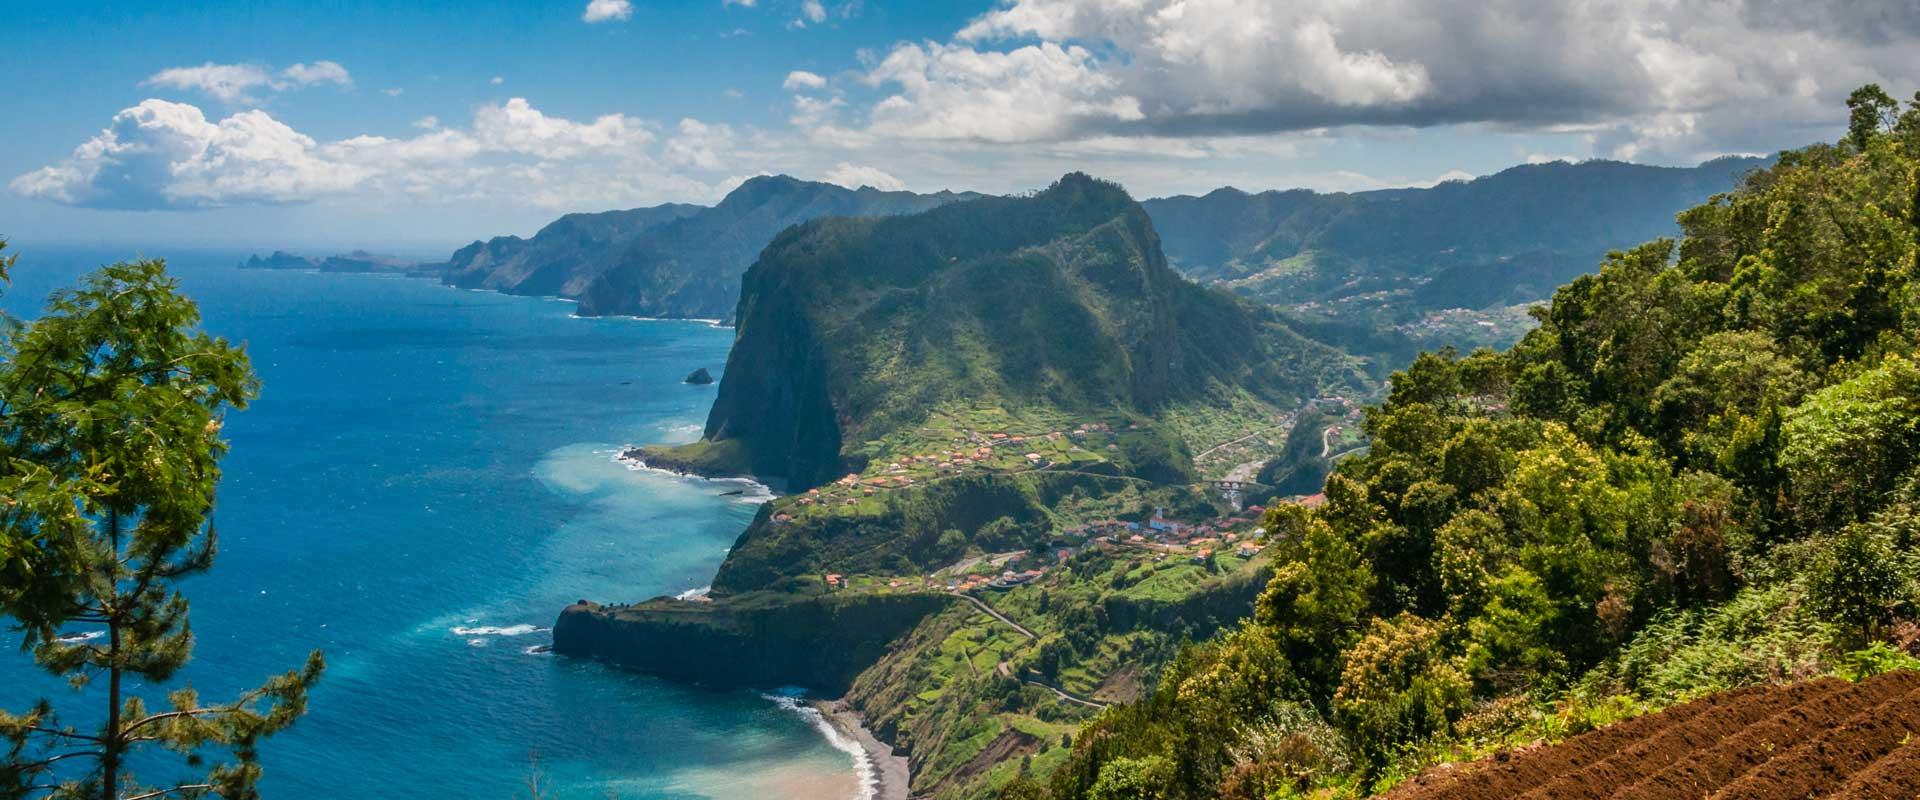 Bjergvandring på Madeira